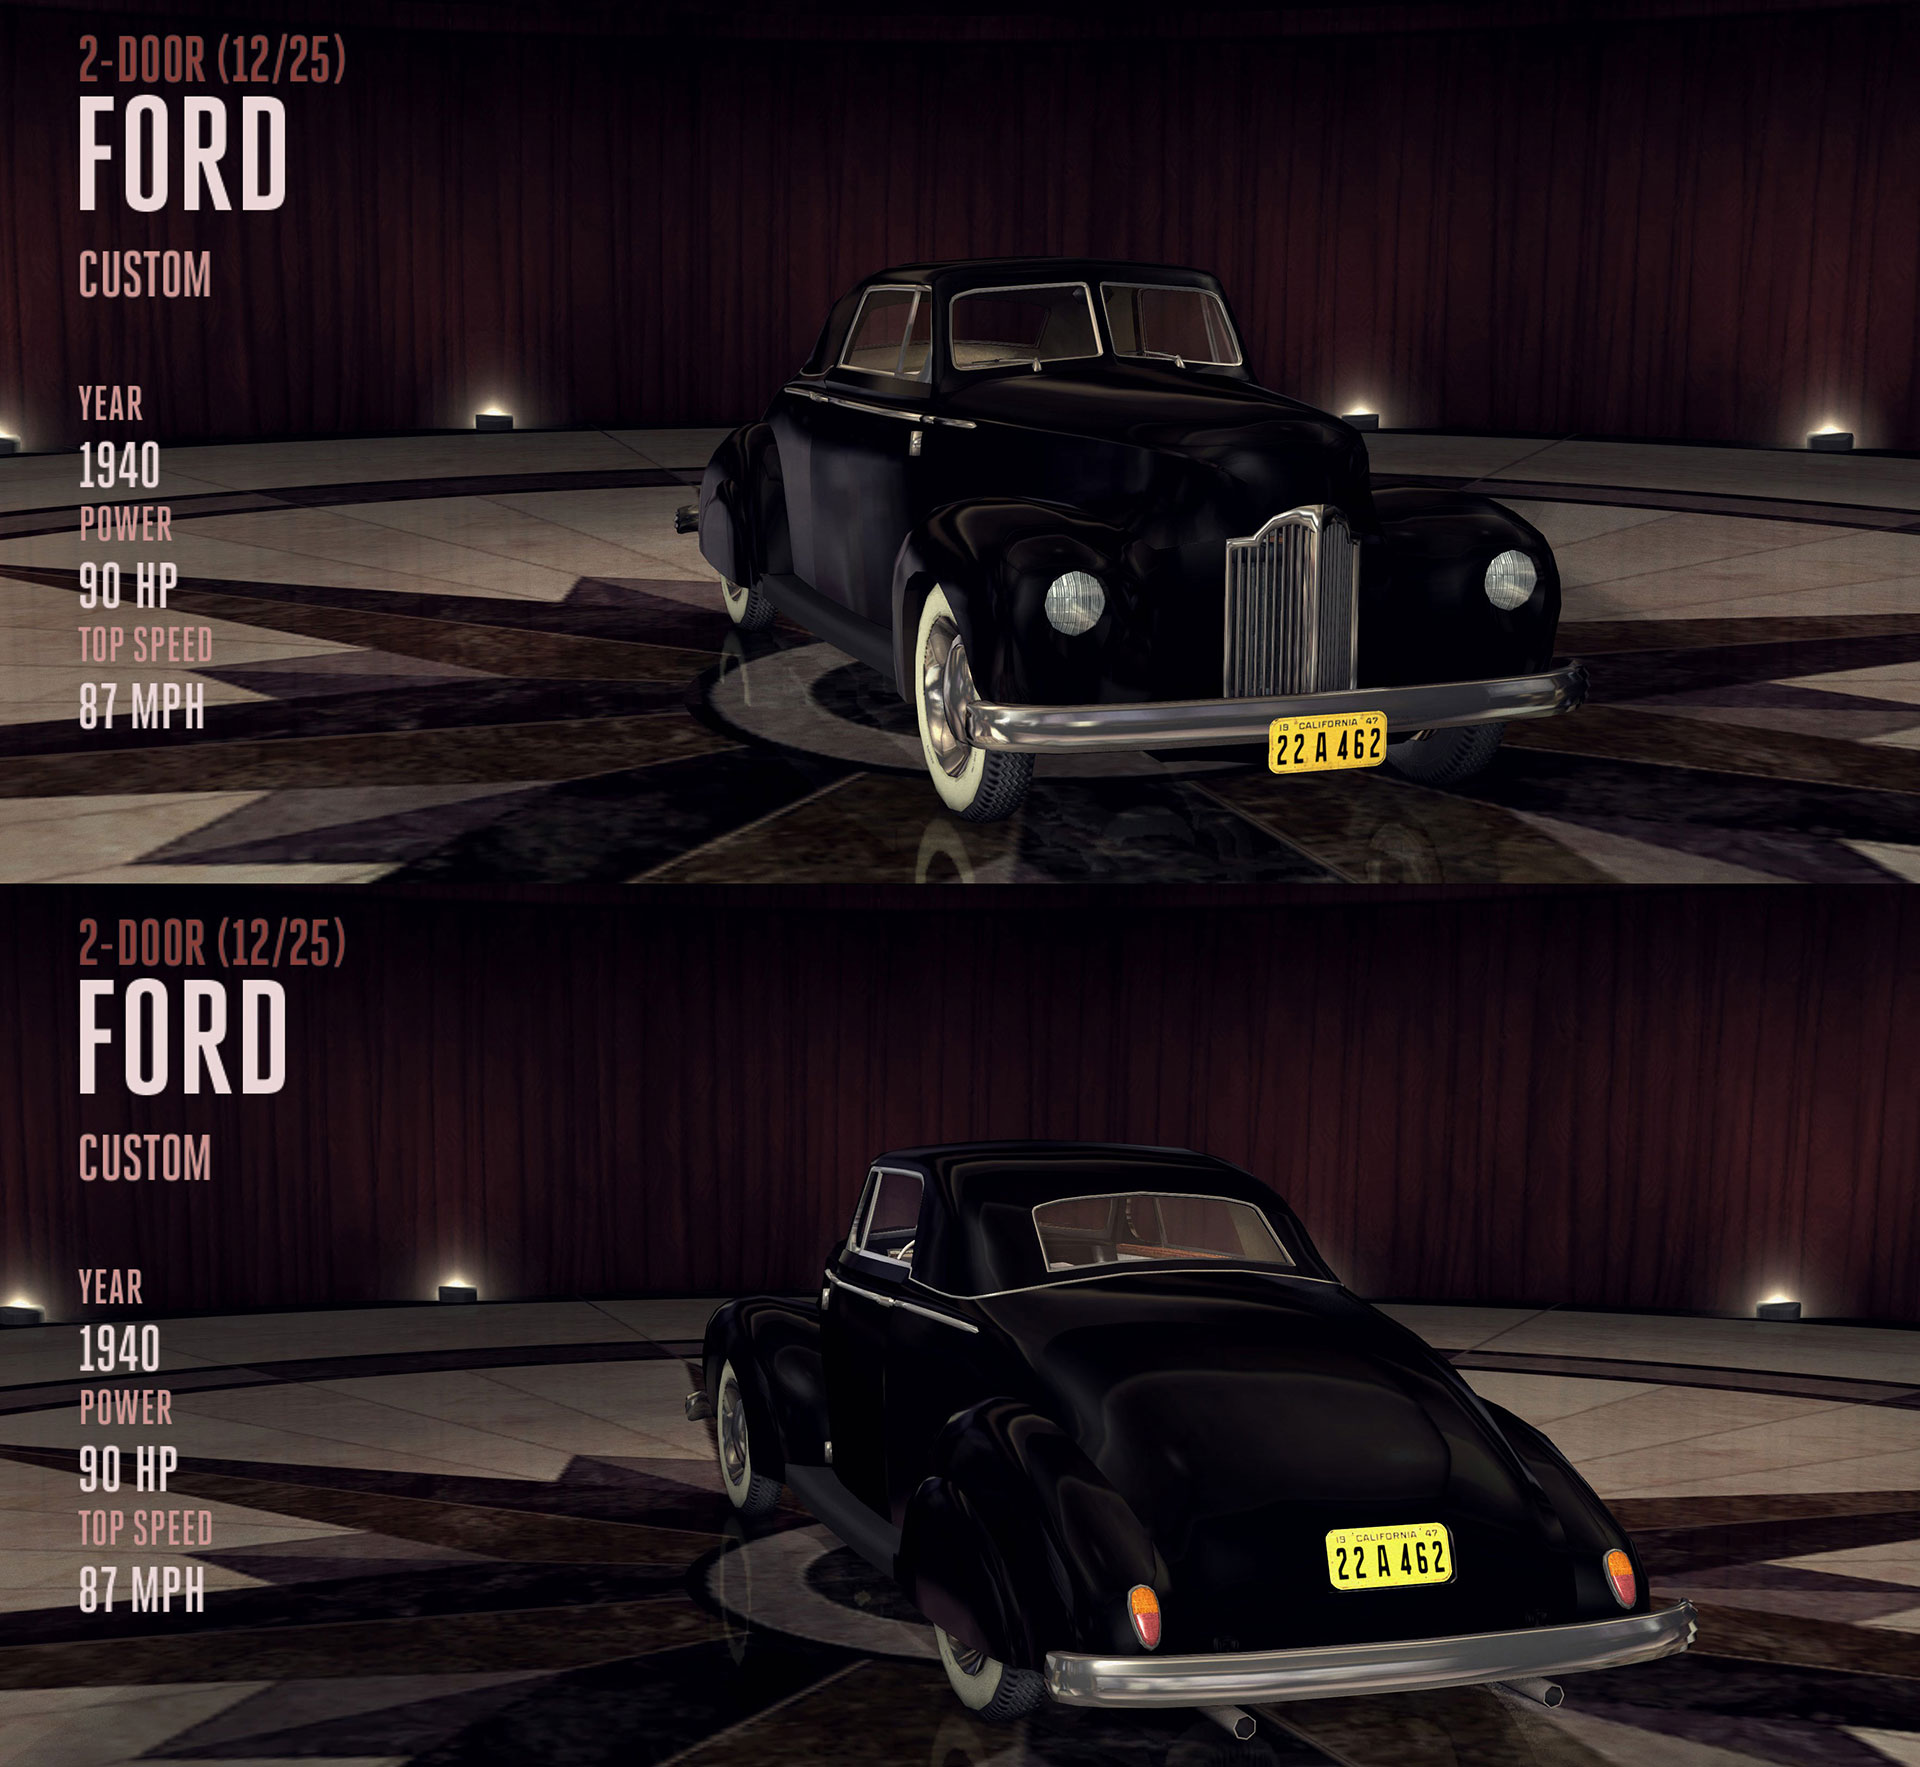 File:1940-ford-custom.jpg